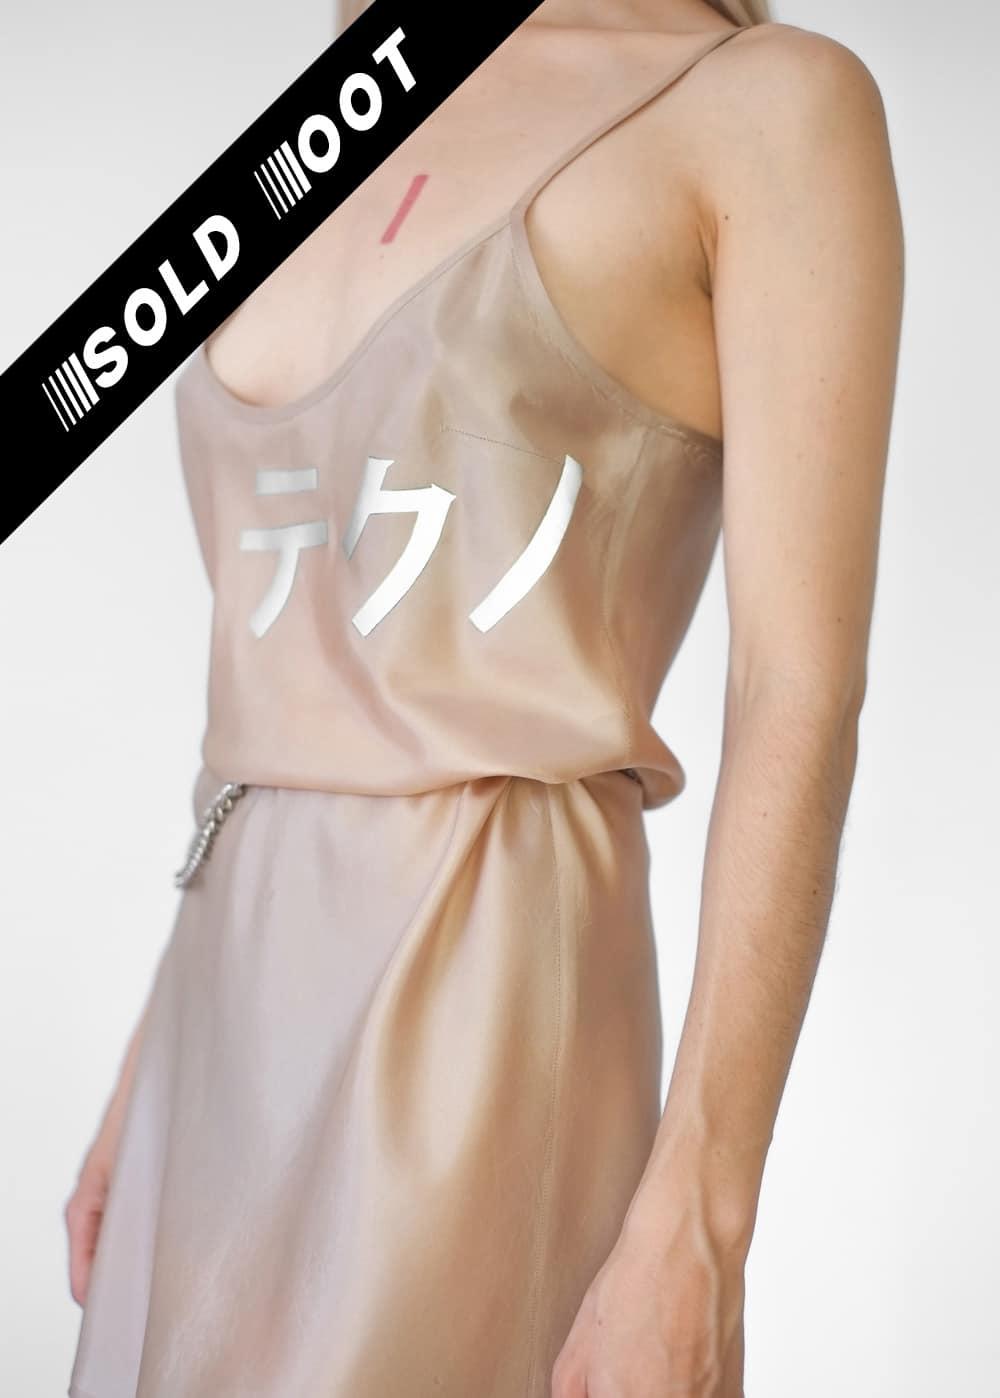 Reflective 'テクノ' Nude Dress 347